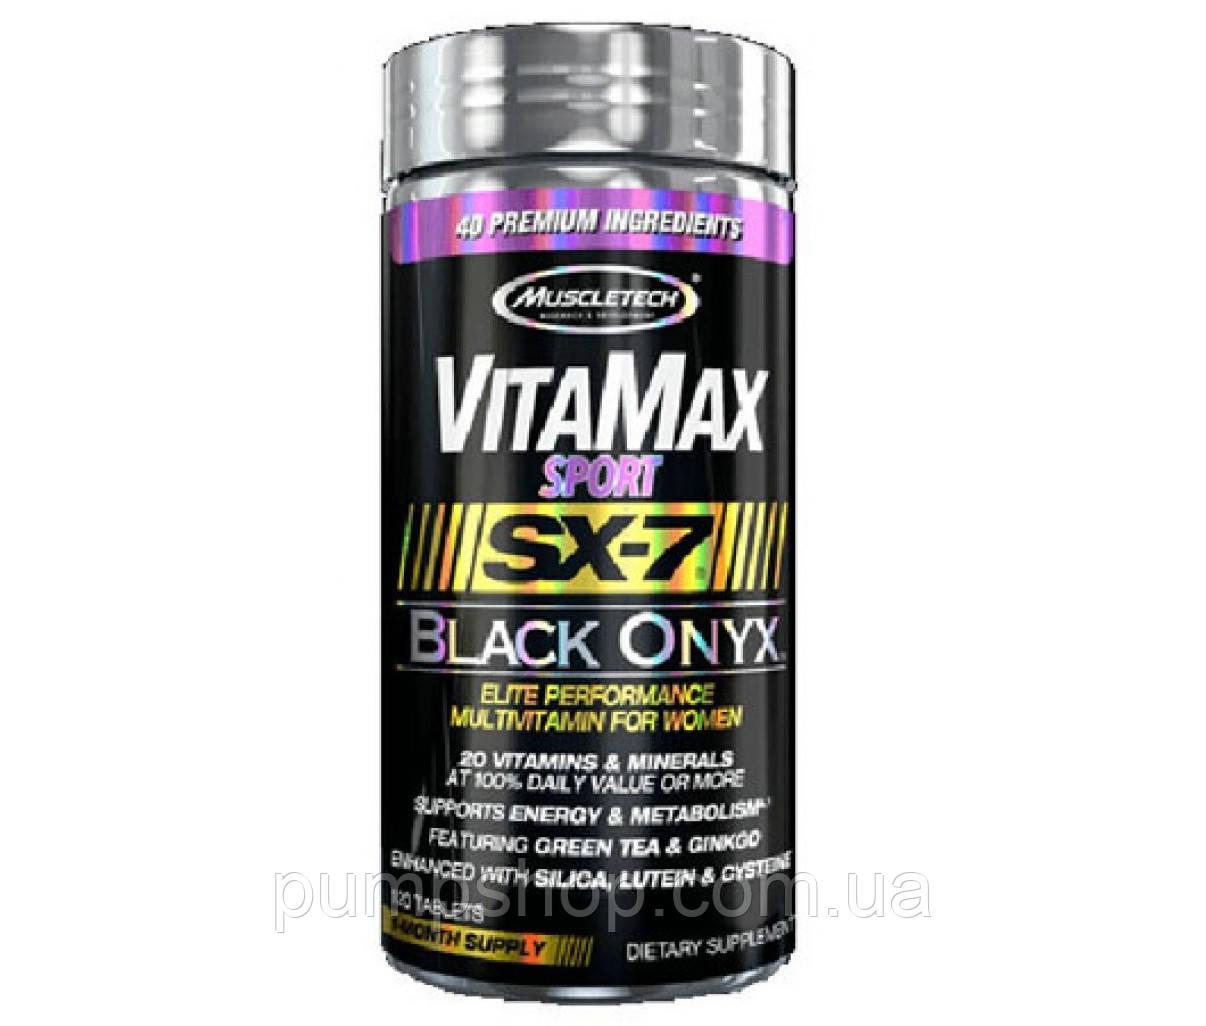 Витамины для женщин MuscleTech VitaMax Sport SX-7 Black Onyx For Women 120 таб.